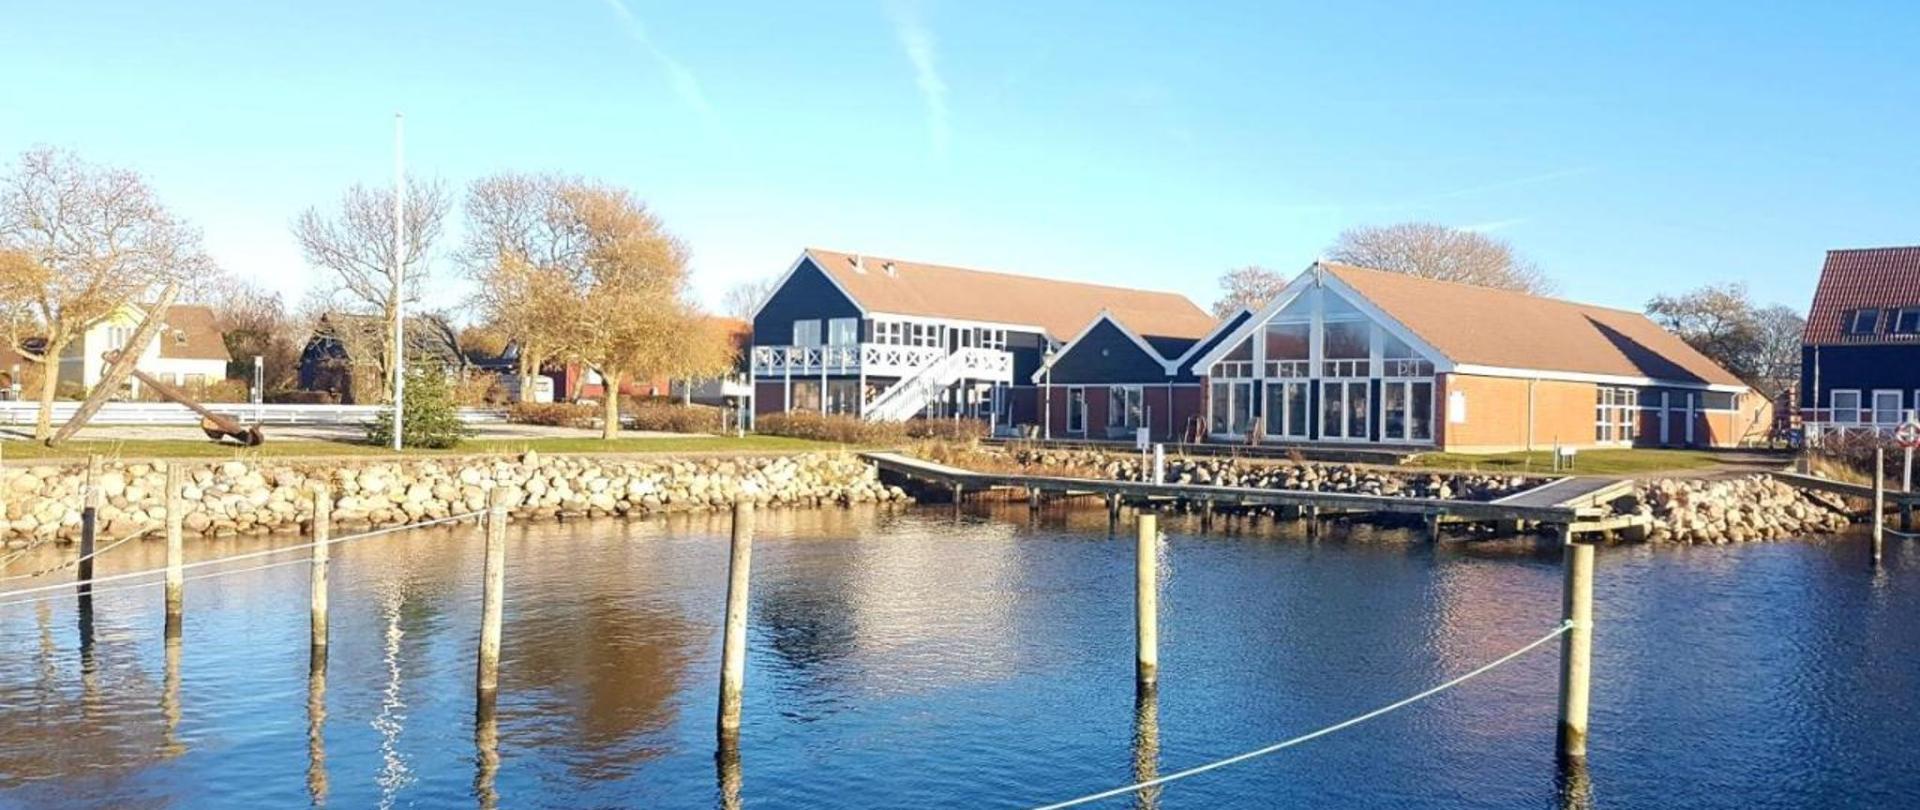 Klintholm Marina Park Cabins